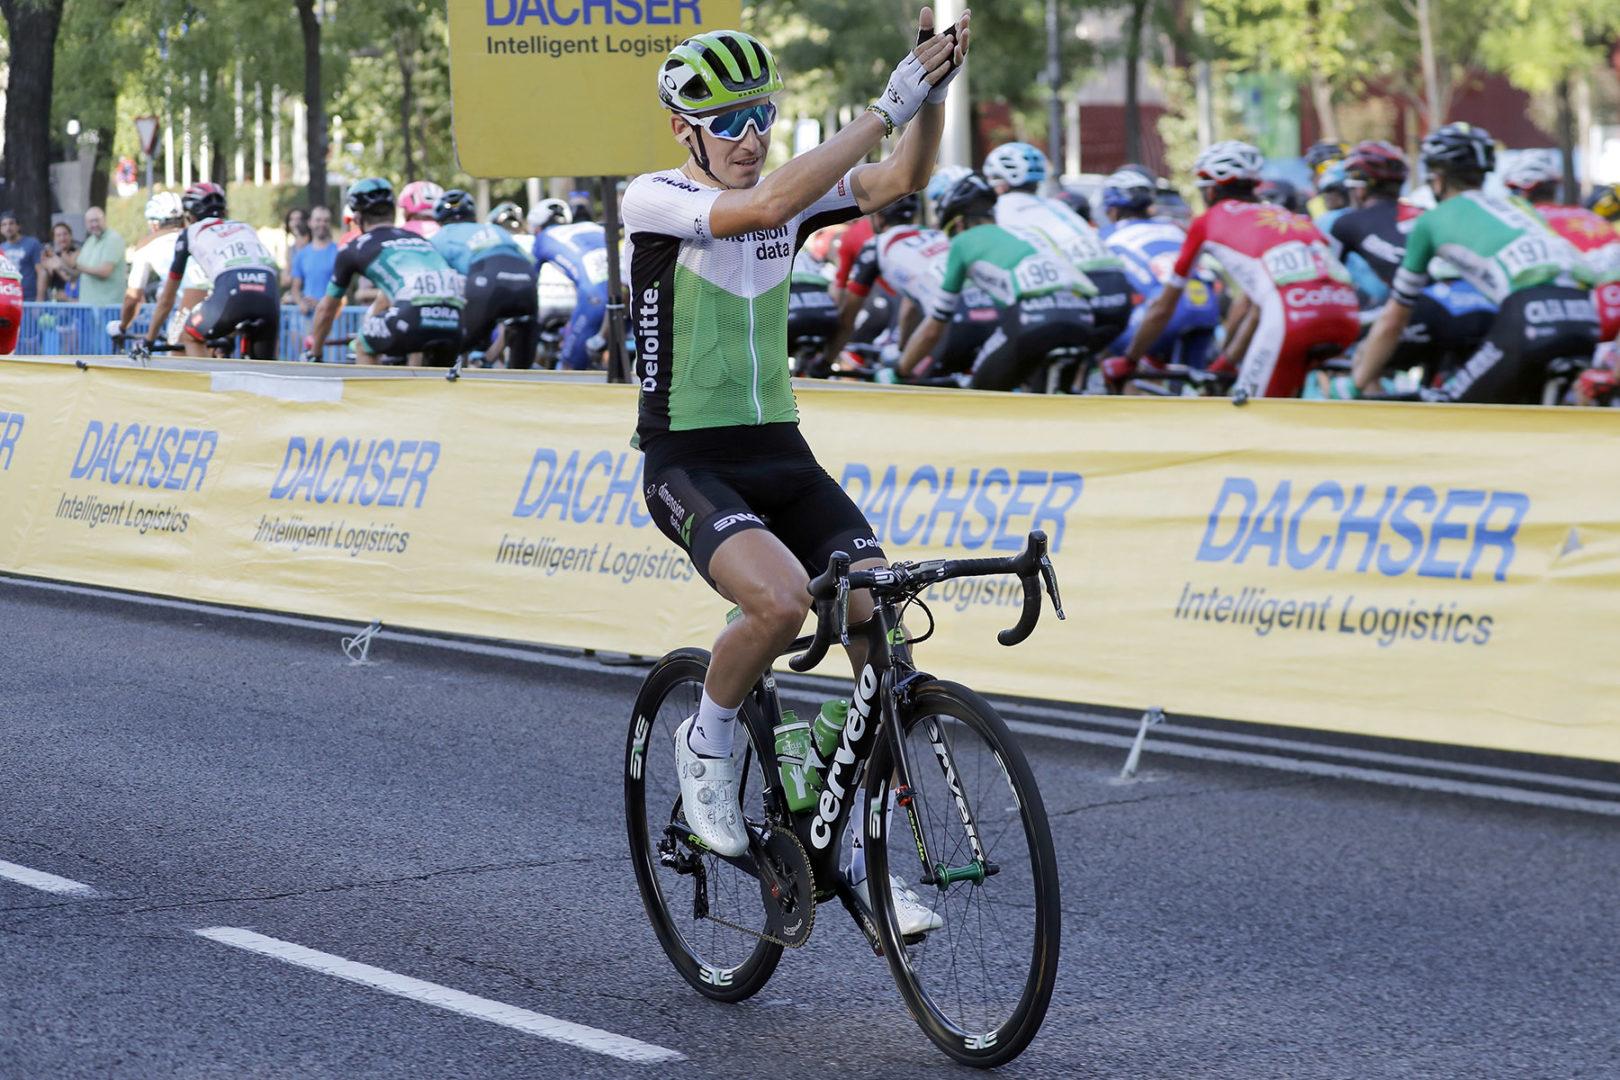 Vuelta Espana 2018; Etapa 21 Alcorcon - Madrid .100;9 Km ; Domingo 16/09/2018